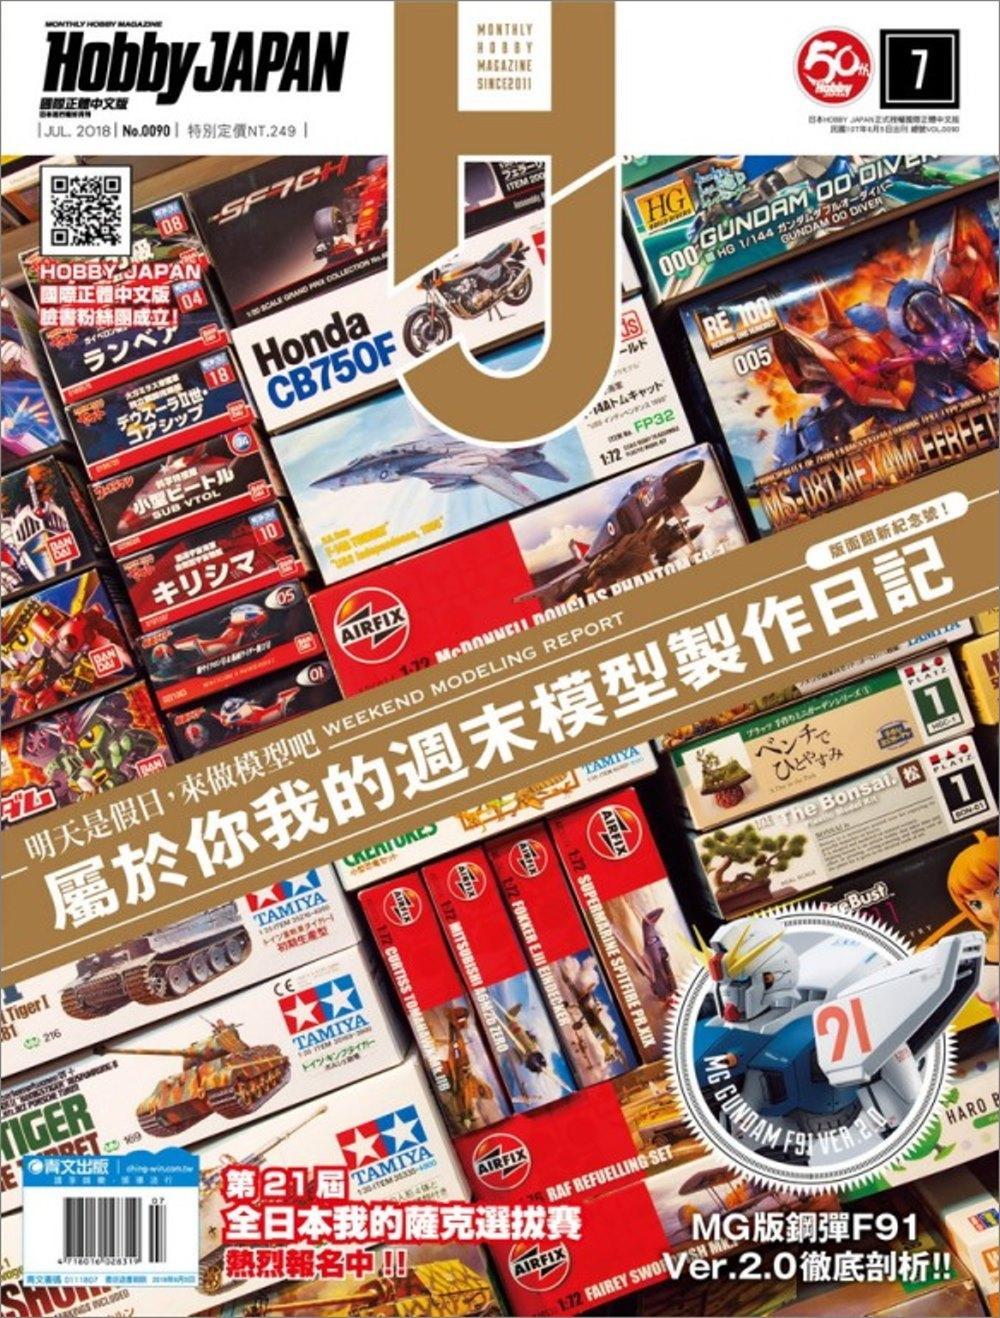 HOBBY JAPAN 7月號/2018 第90期